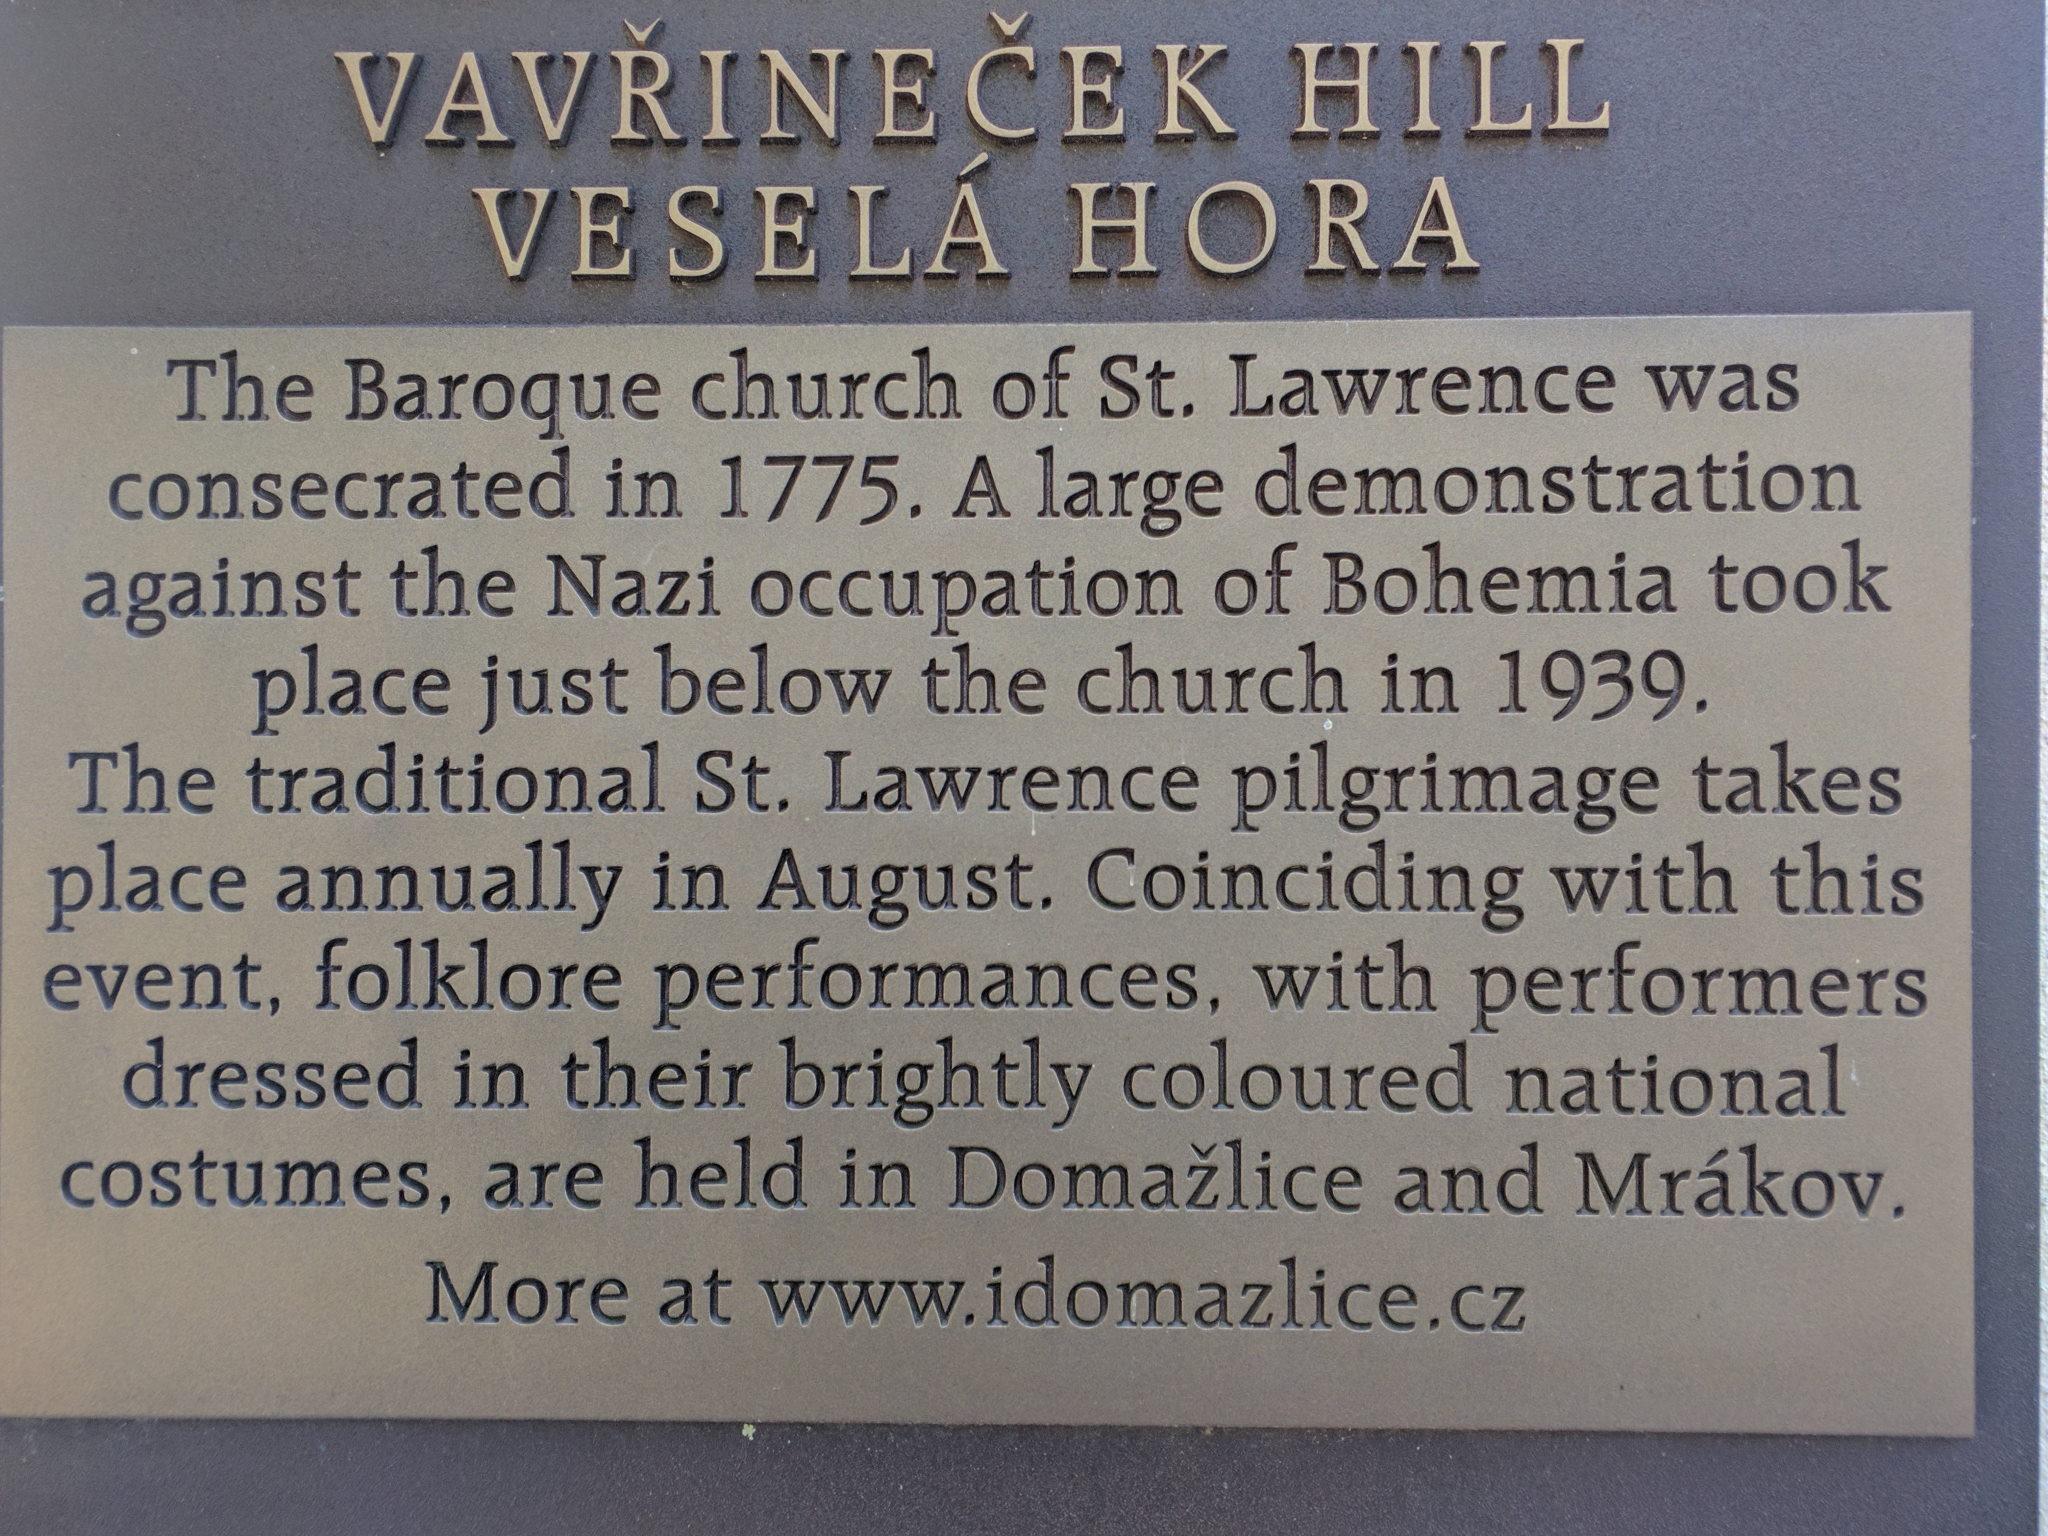 Tafel an der St.-Laurentius-Kirche